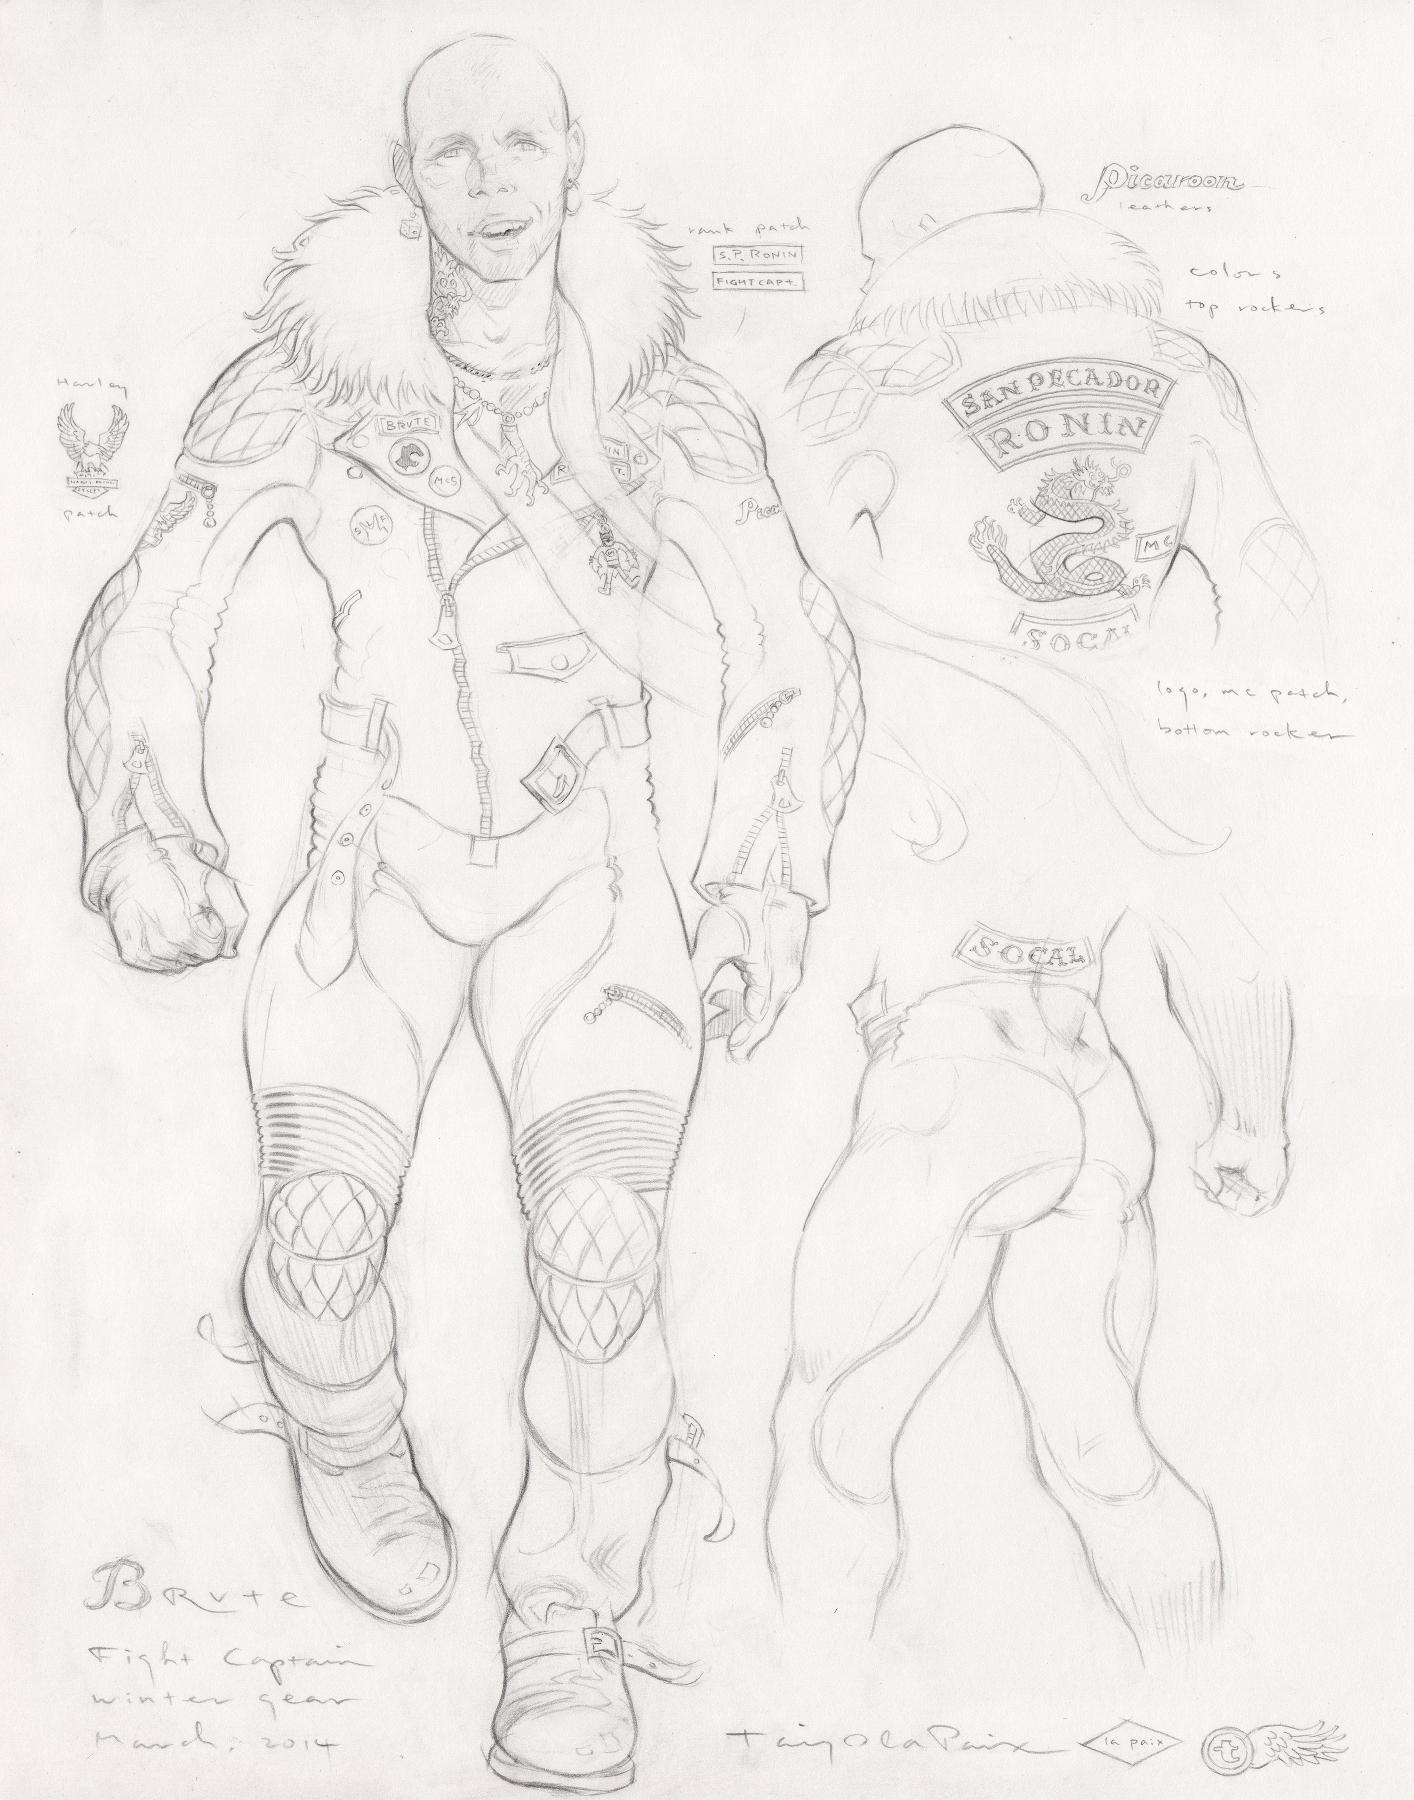 Brute, Winter Gear, 2014, pencil on paper, 14 x 11 inches